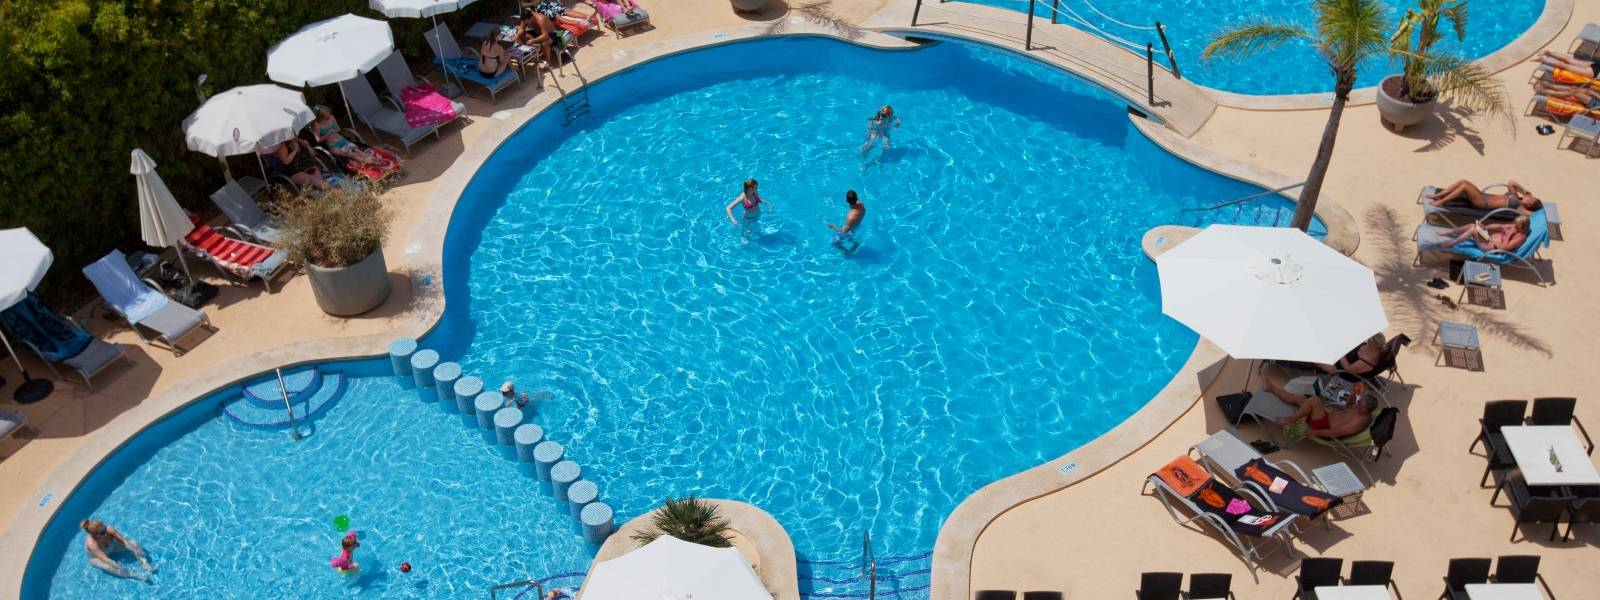 jsalcudimar_piscina.jpg